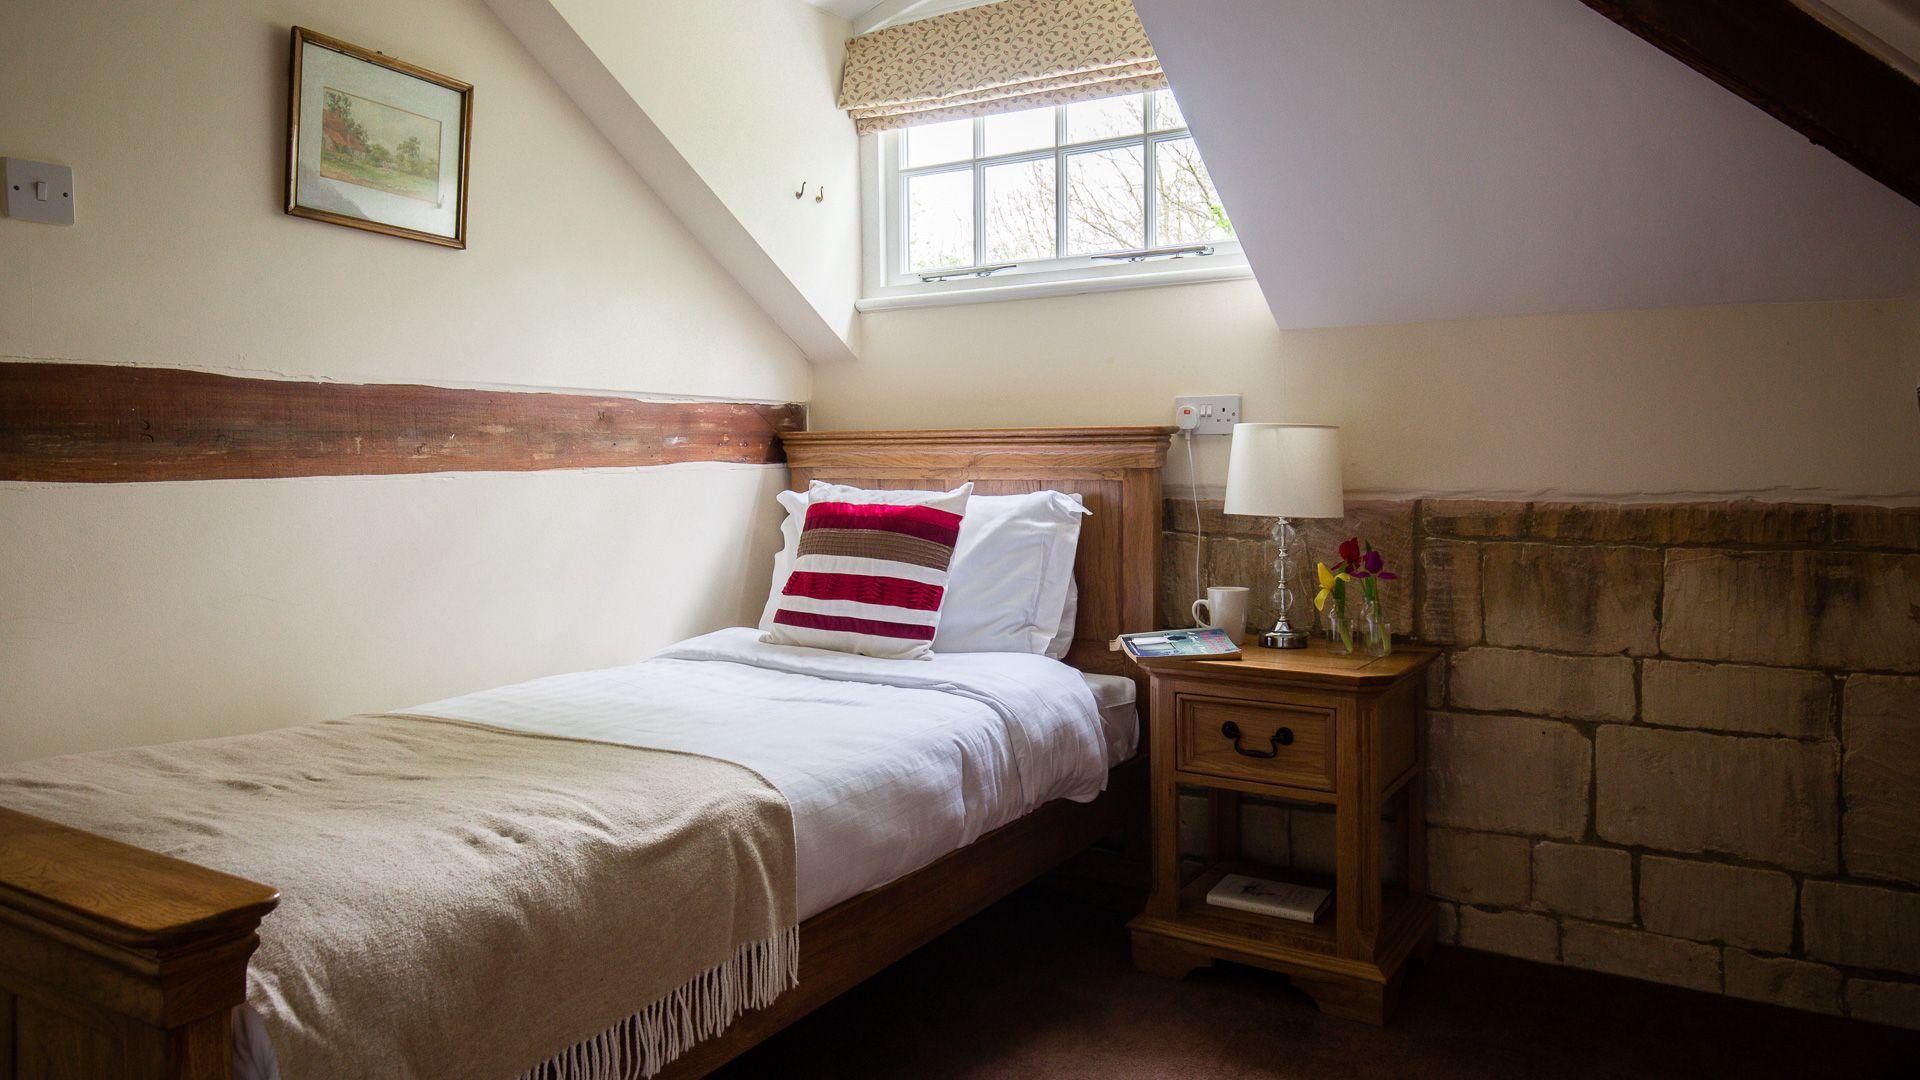 Bedroom Two, Prince Rupert at Sudeley Castle, Bolthole Retreats